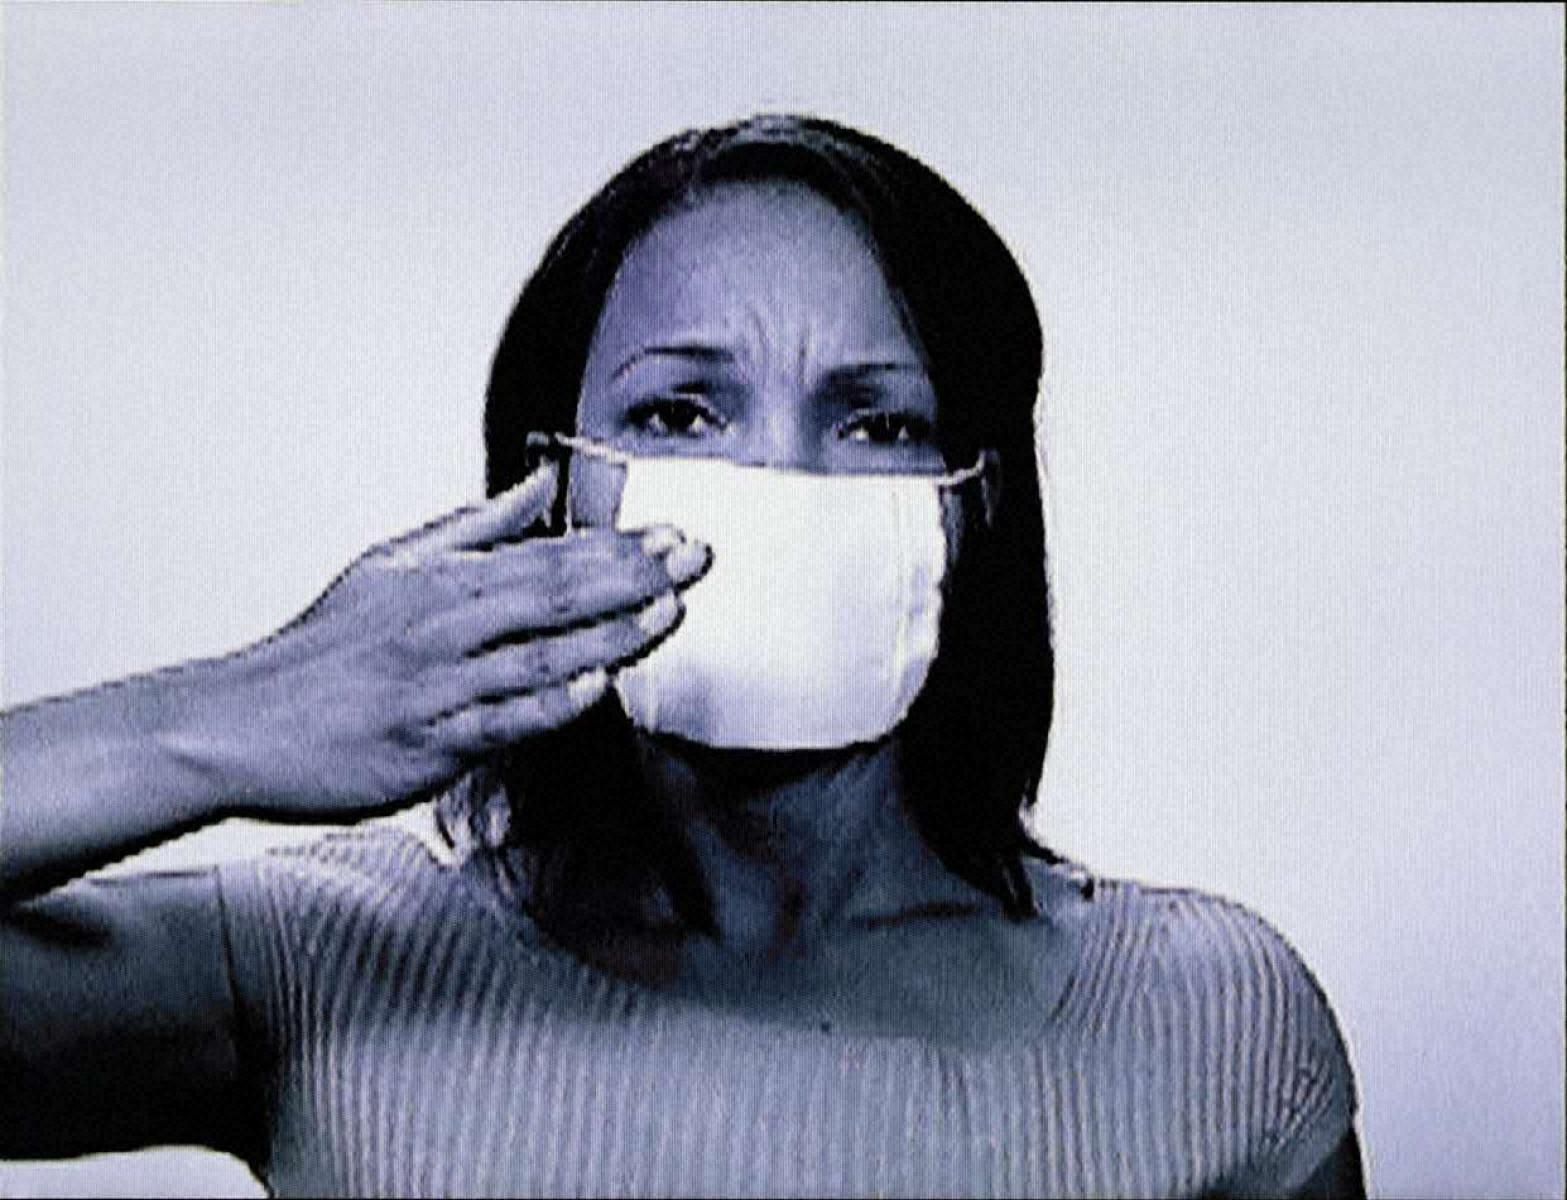 Silent Breath 10/11/2001 NYC(Hand Movement)